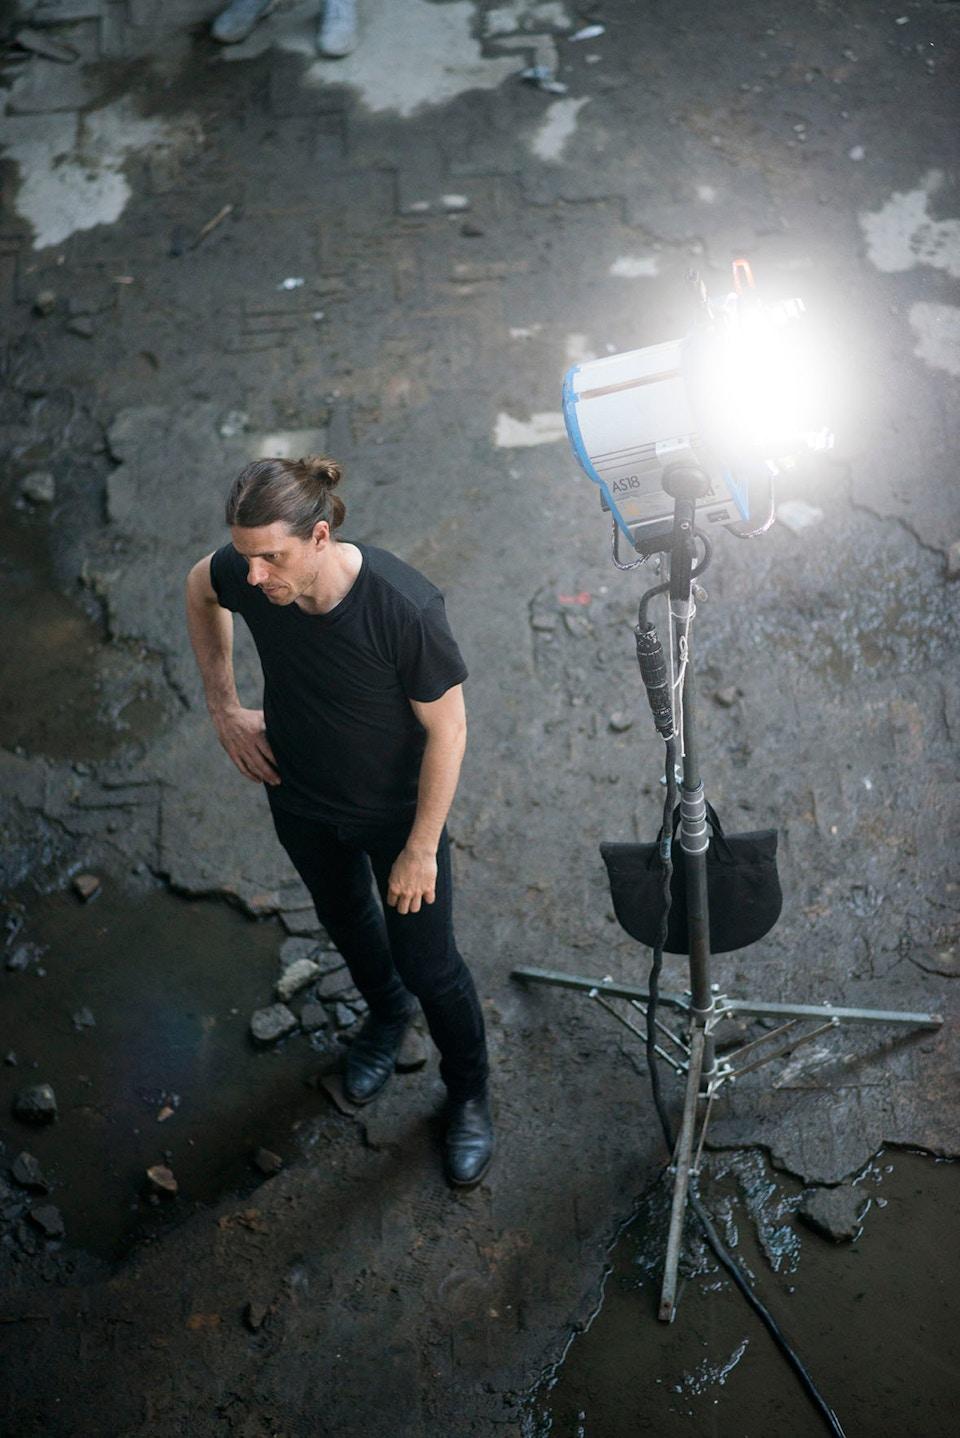 DOP Erik Sohlström on set of XXL in Rio. Photo ©Miguel Blanc/Southwest